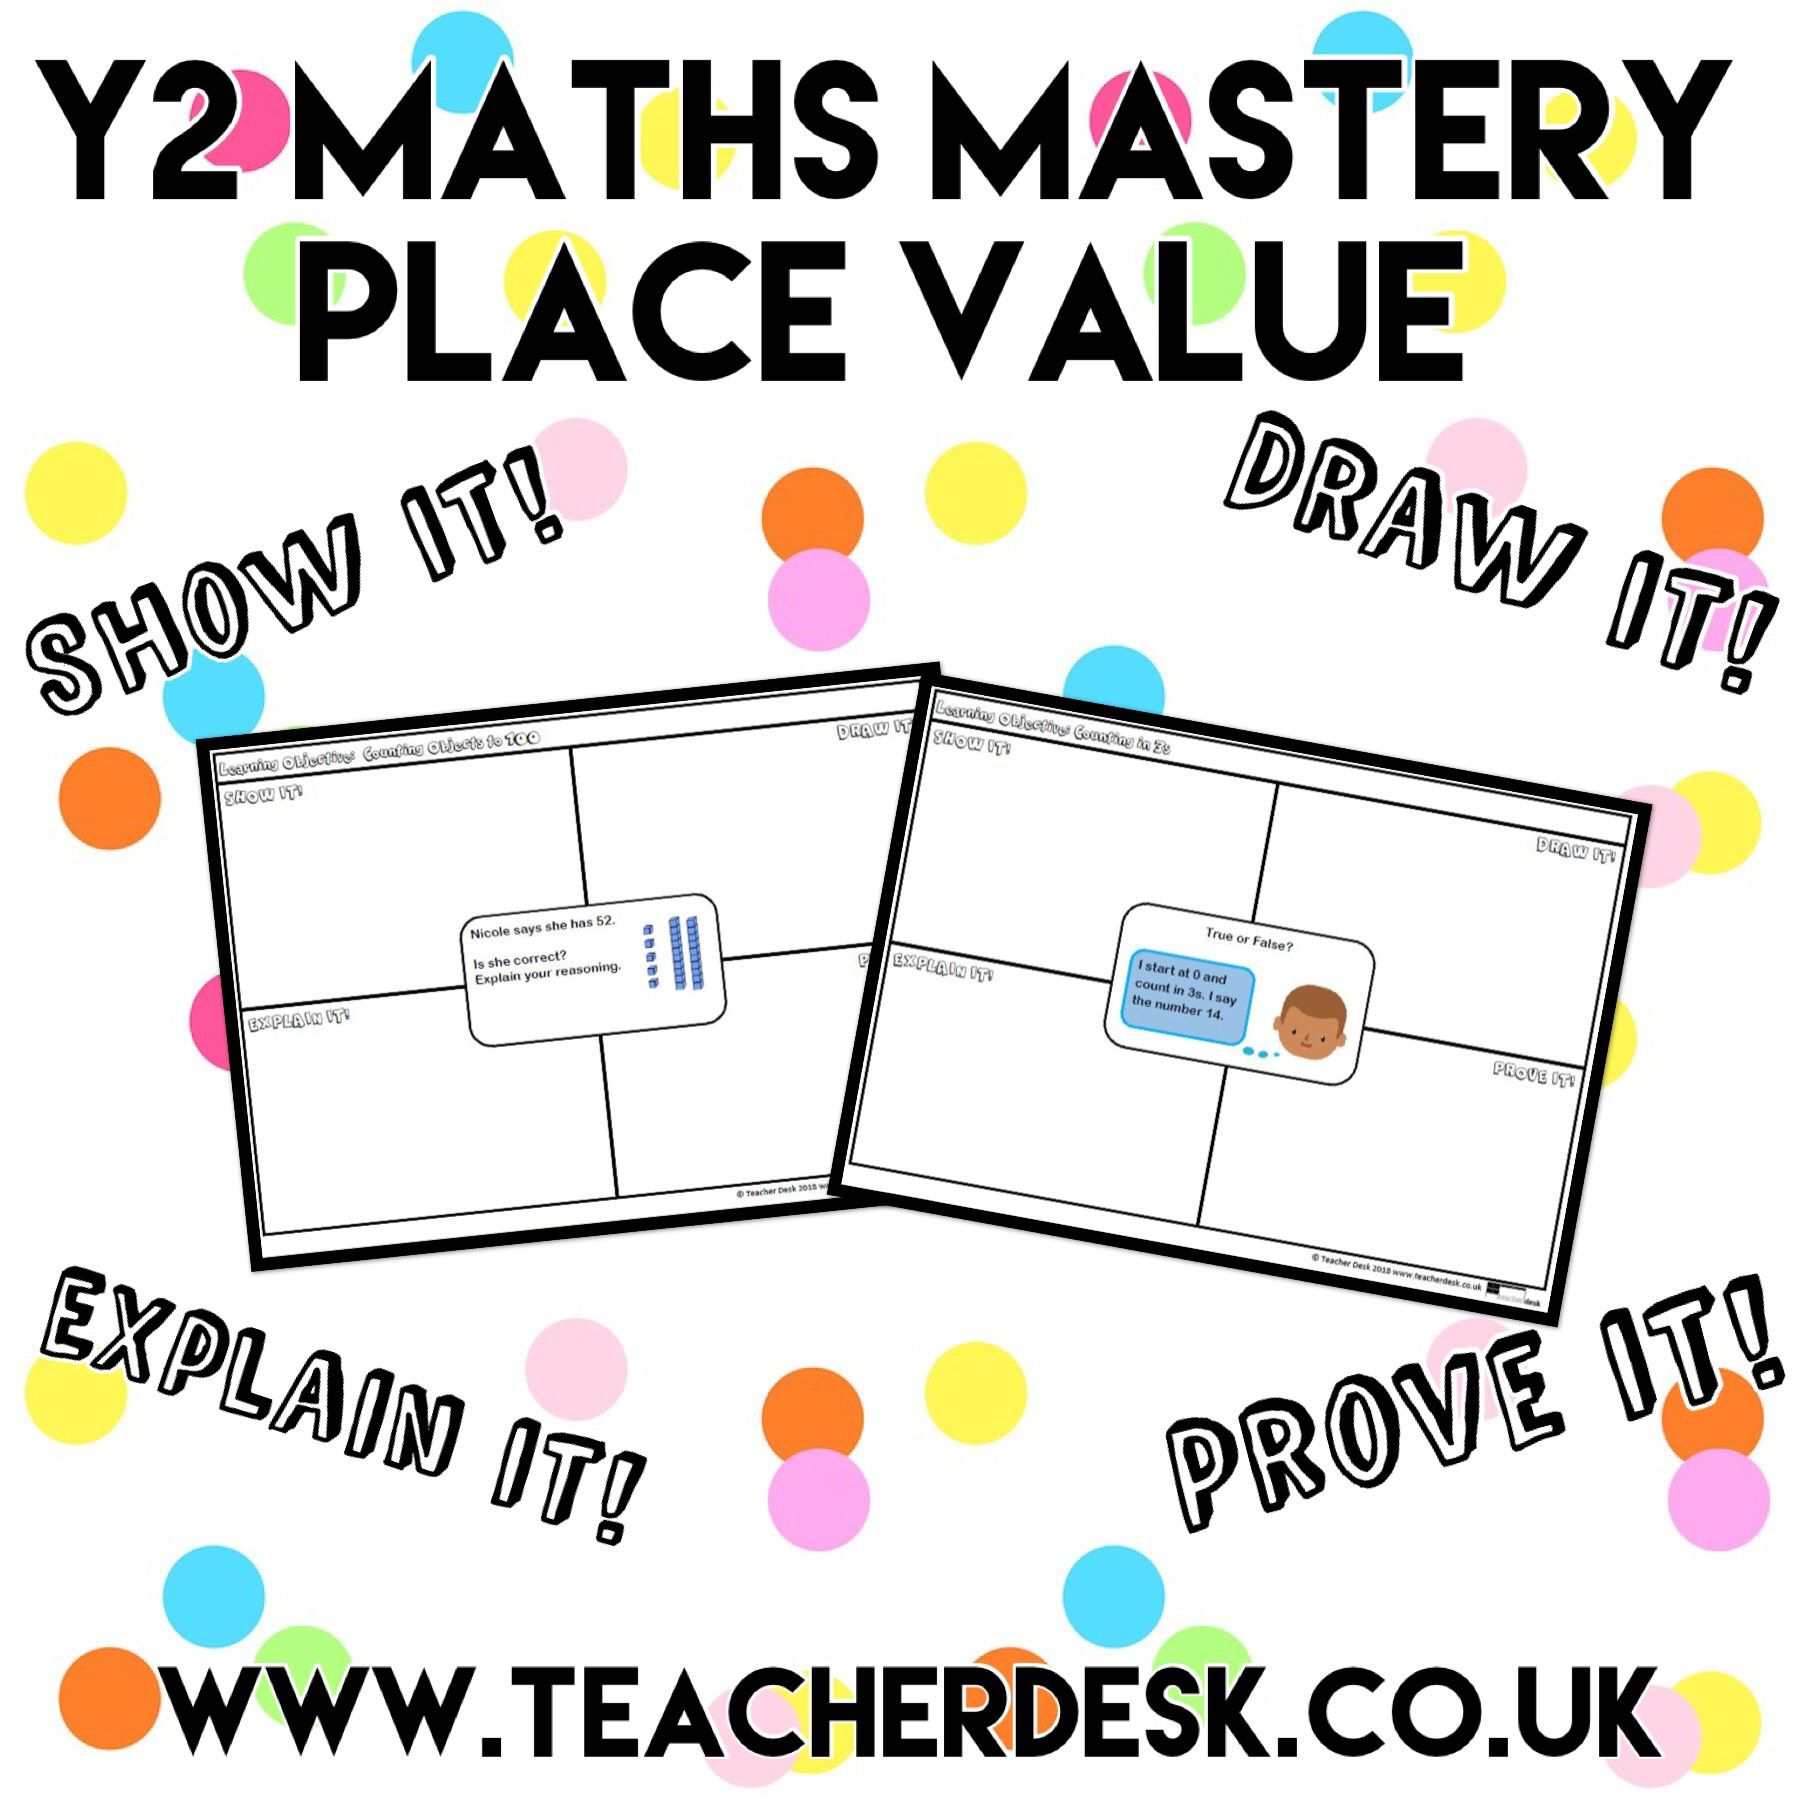 Y2 Maths Mastery Place Value Teacher Desk Teacherdesk